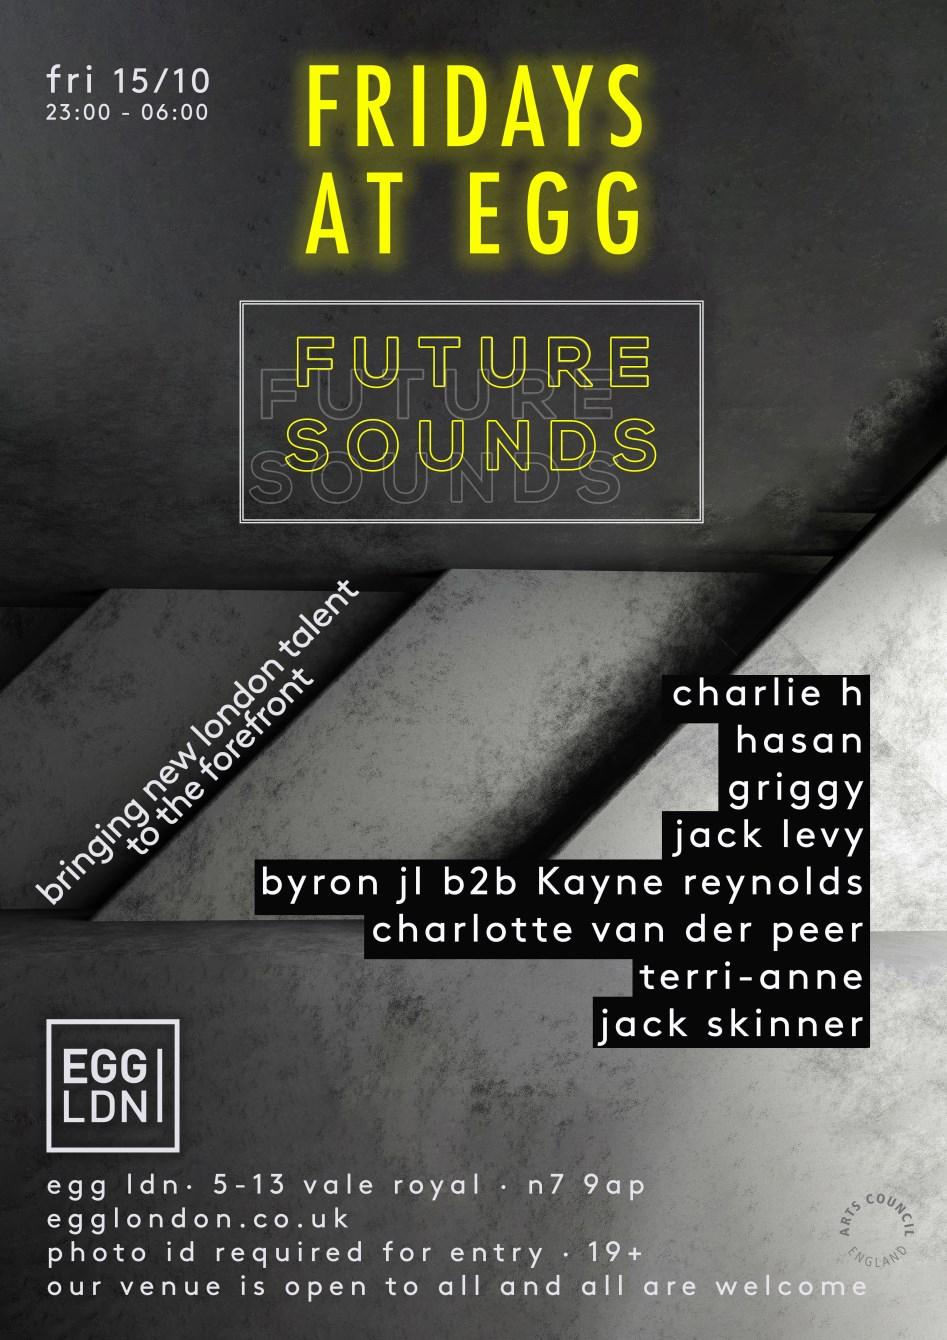 Fridays at EGG: Future Sound (London) - Flyer back